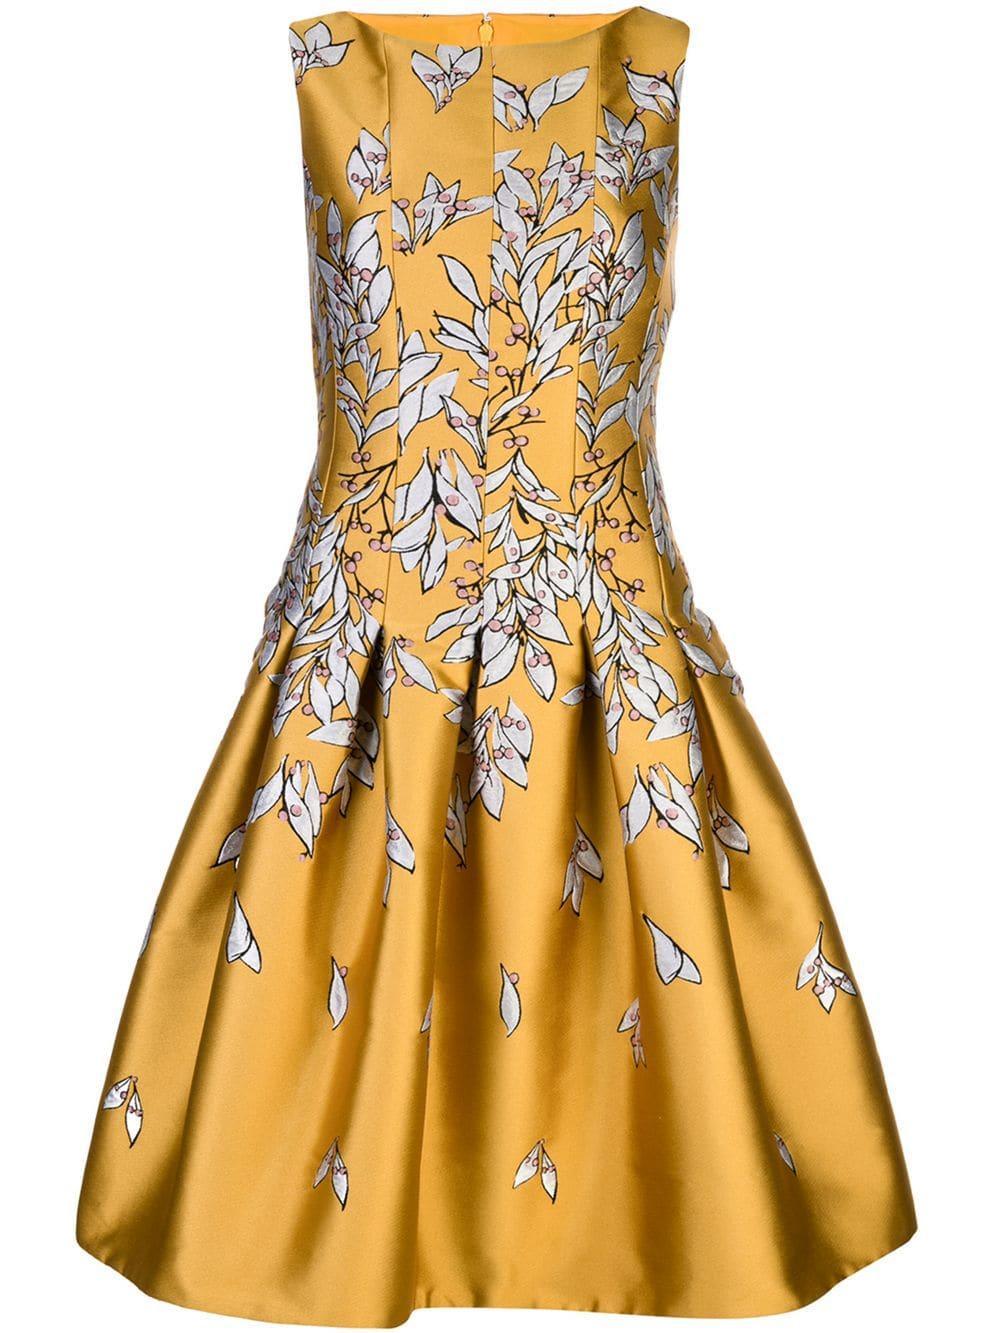 Sleeve Less Tucked Bodice Sign Dress